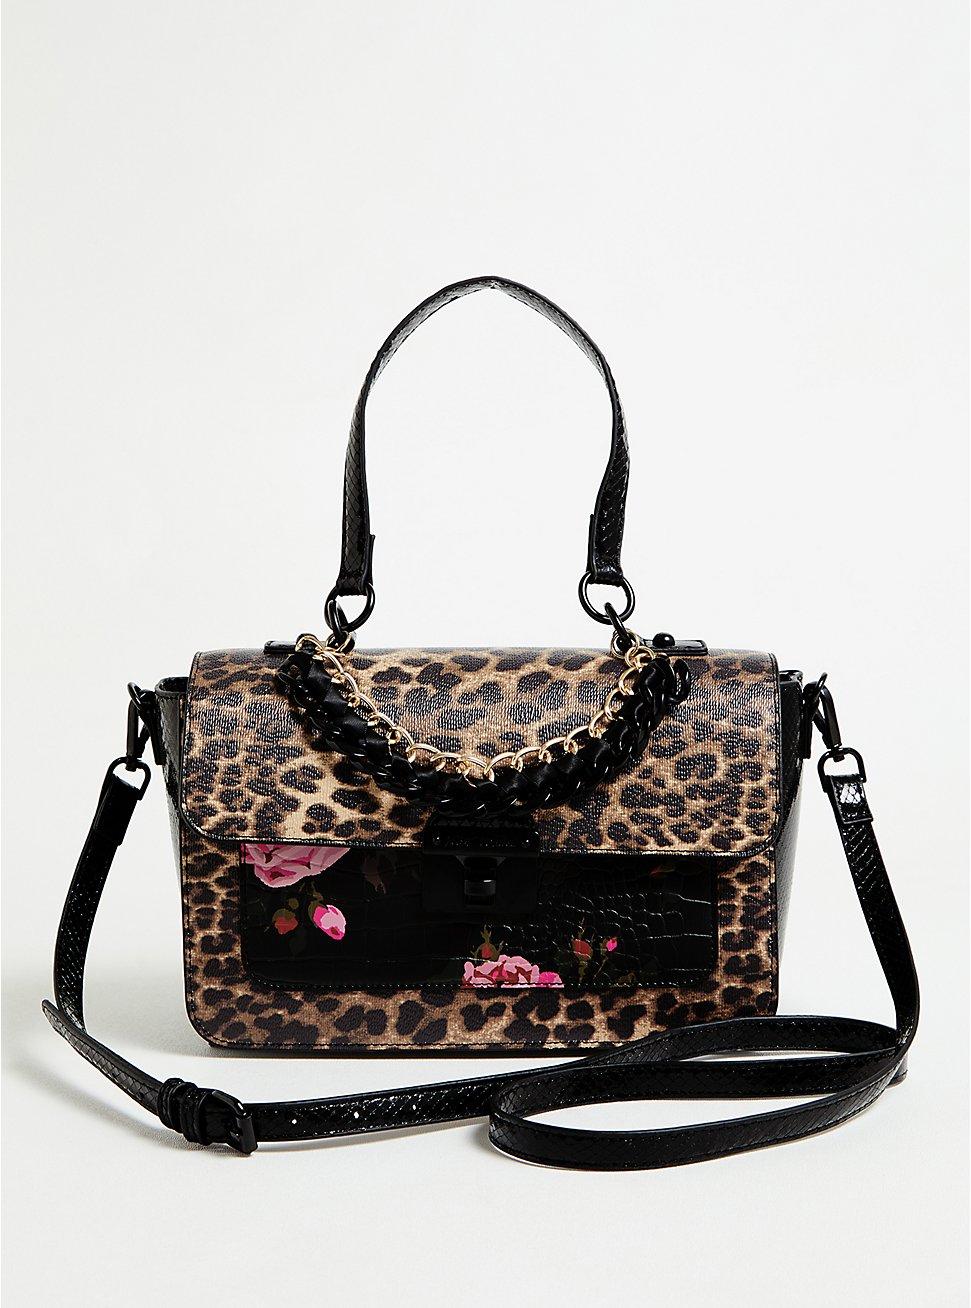 Betsey Johnson Leopard Satchel Bag, , hi-res